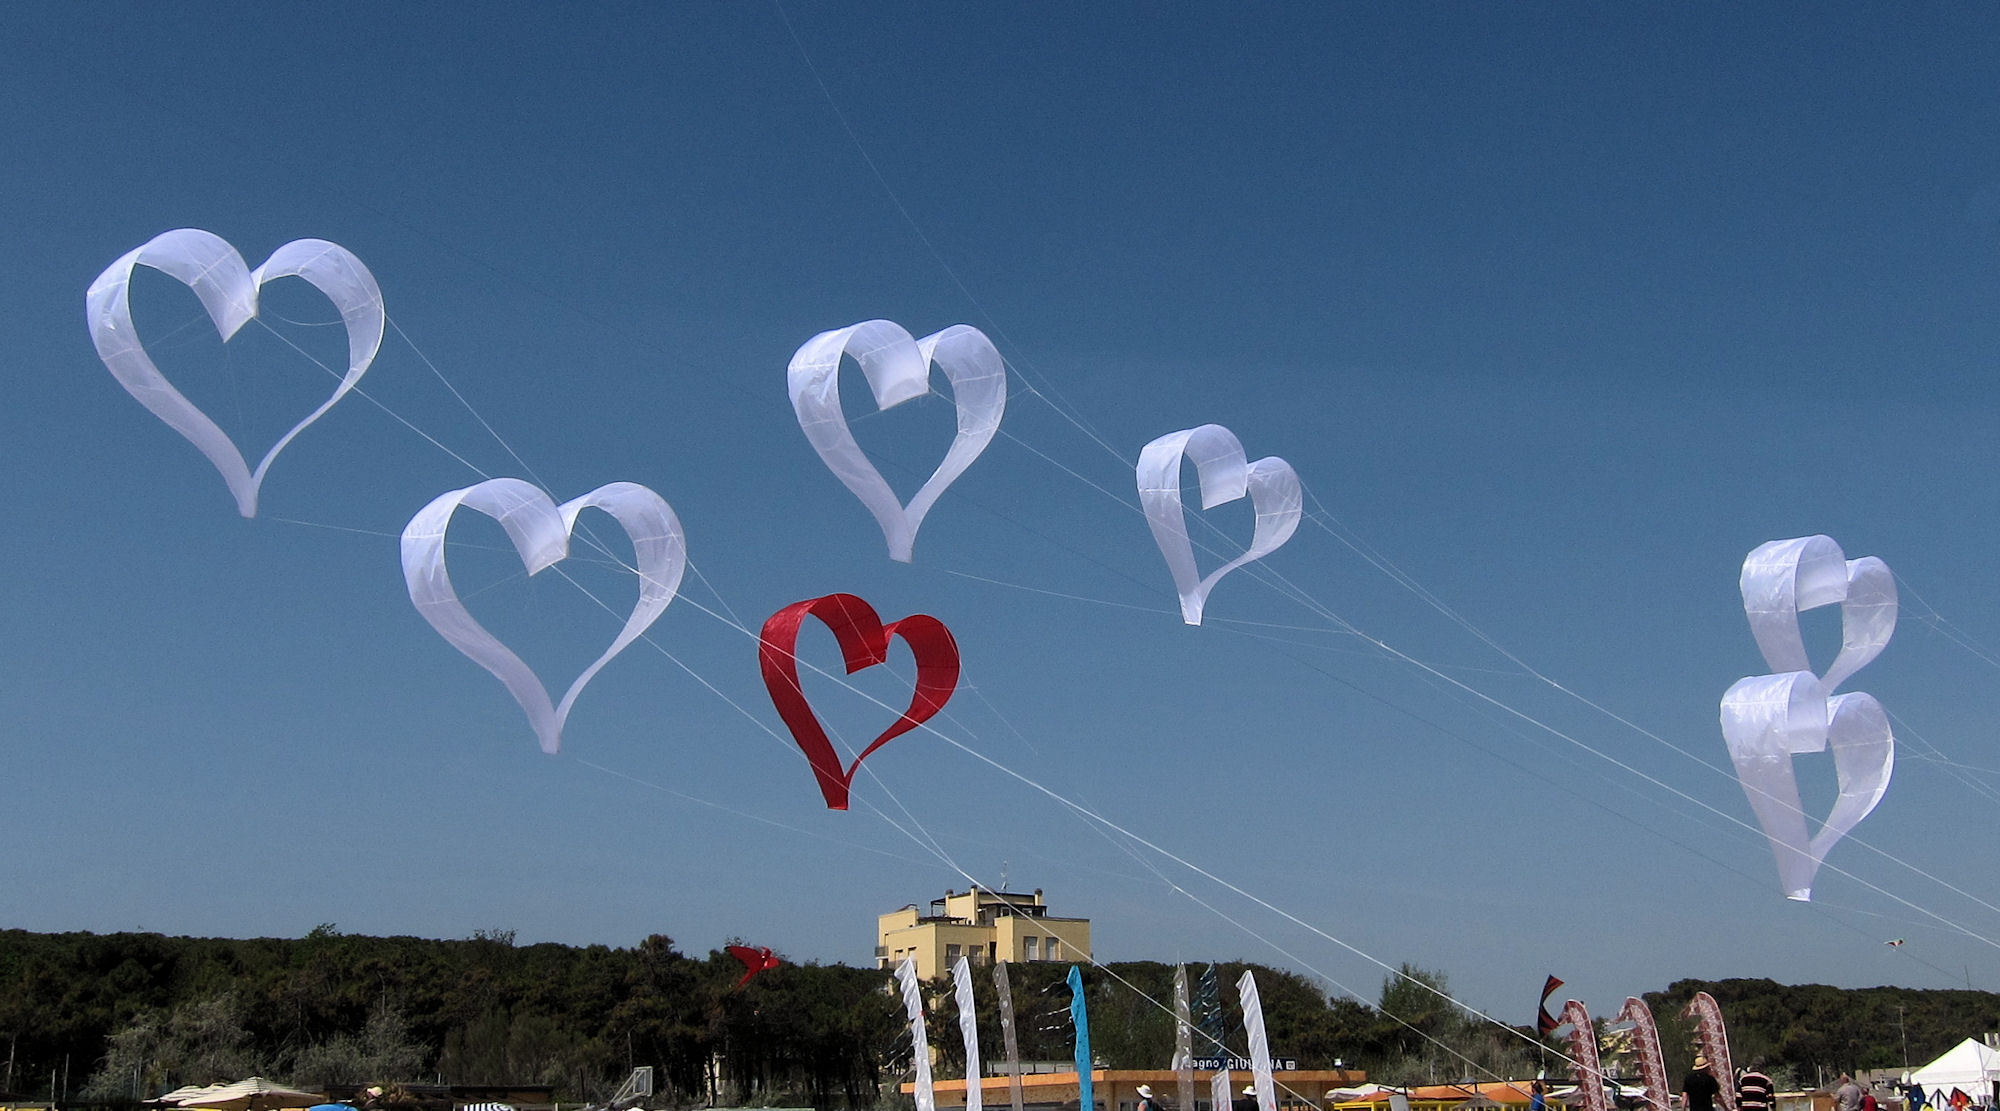 René_Maier_-_Hearts_large